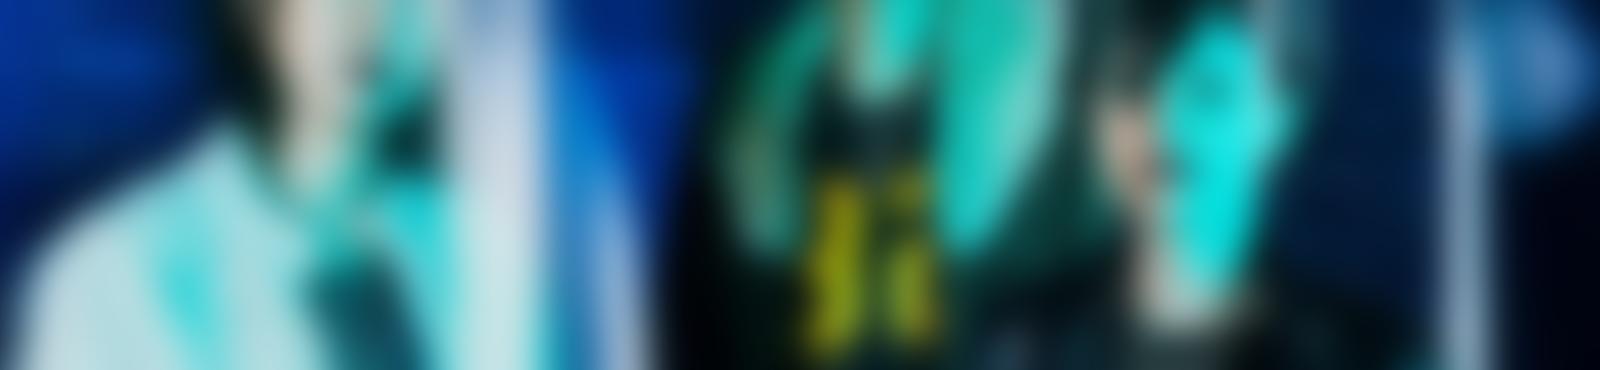 Blurred 5f452237 e8c2 4667 8624 912fe3752b13